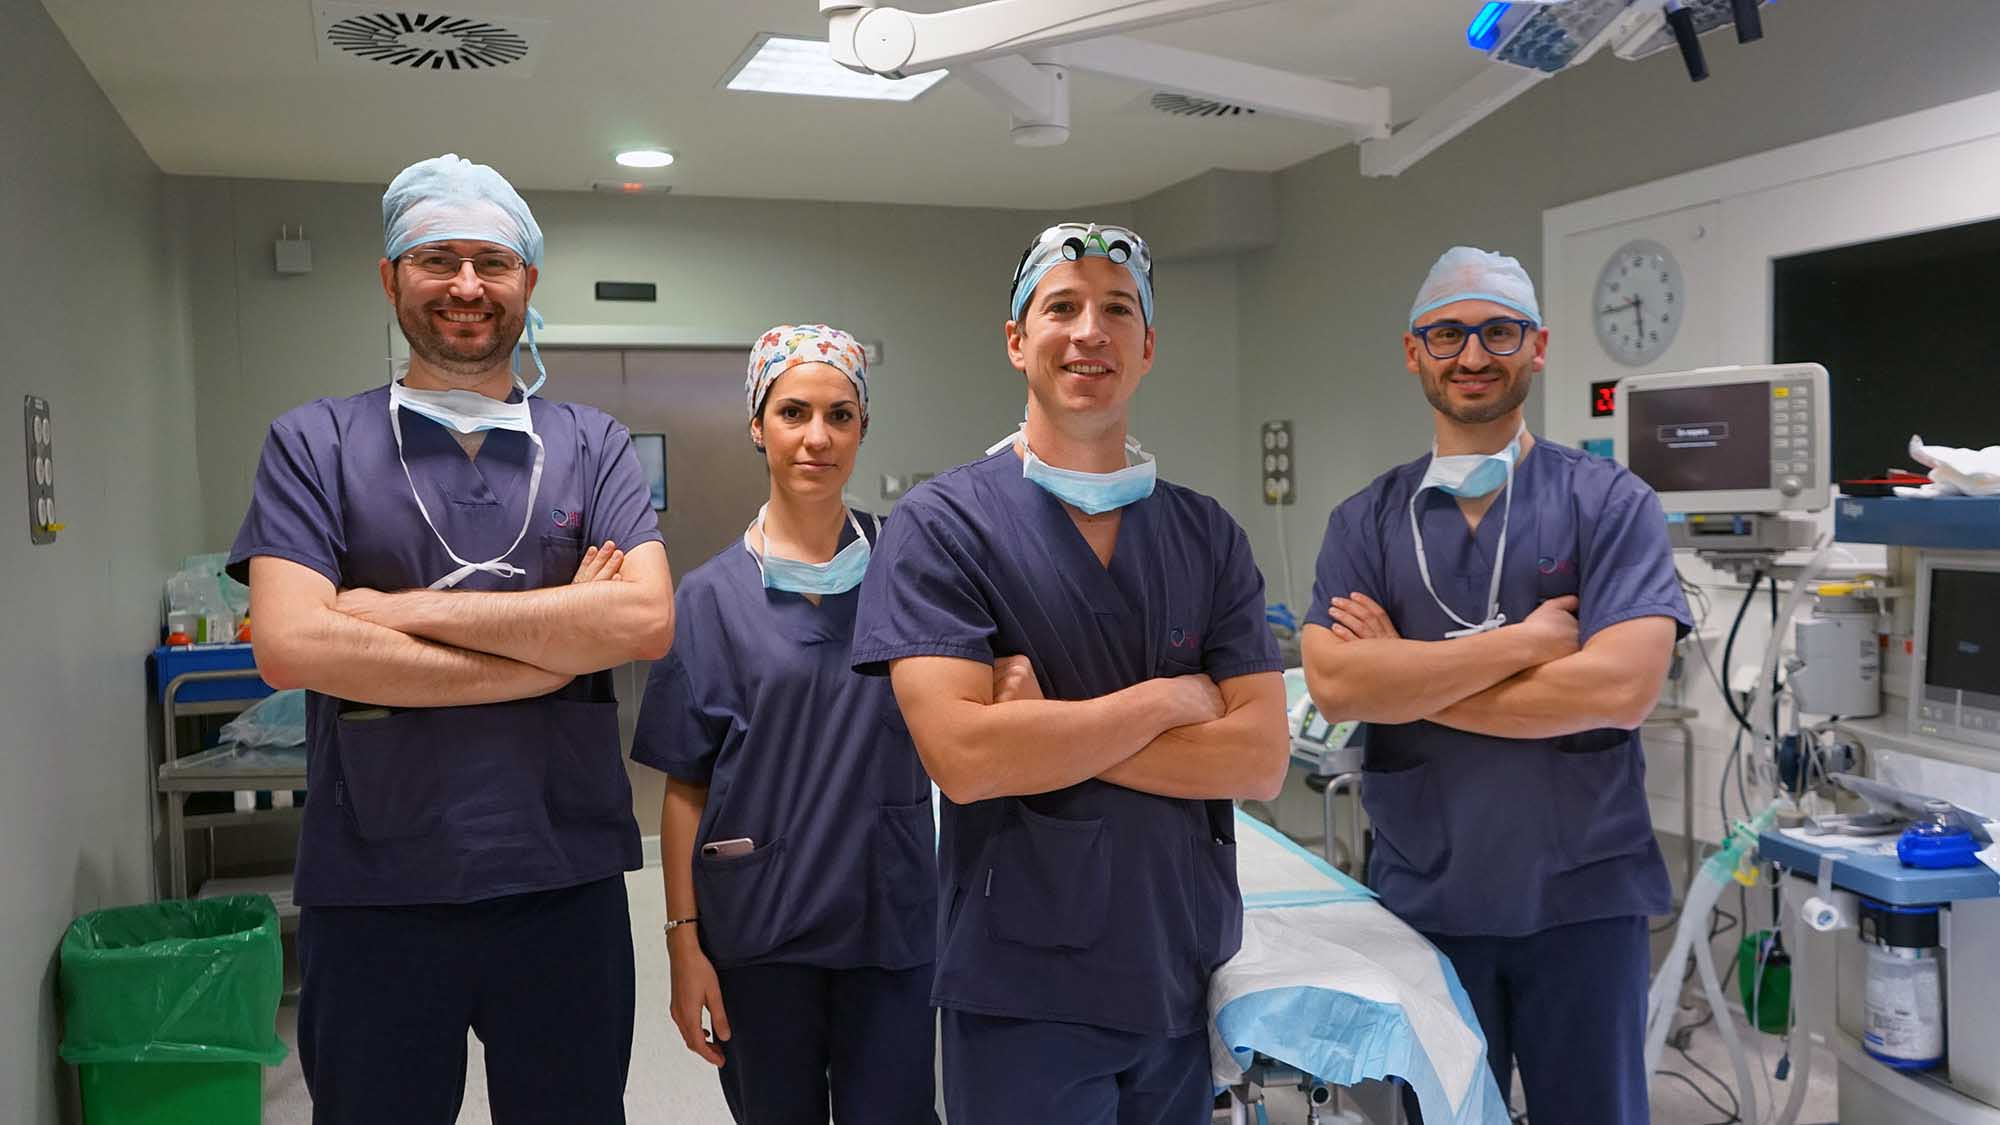 Cirujano de rinoplastia Madrid, Dr. Macía